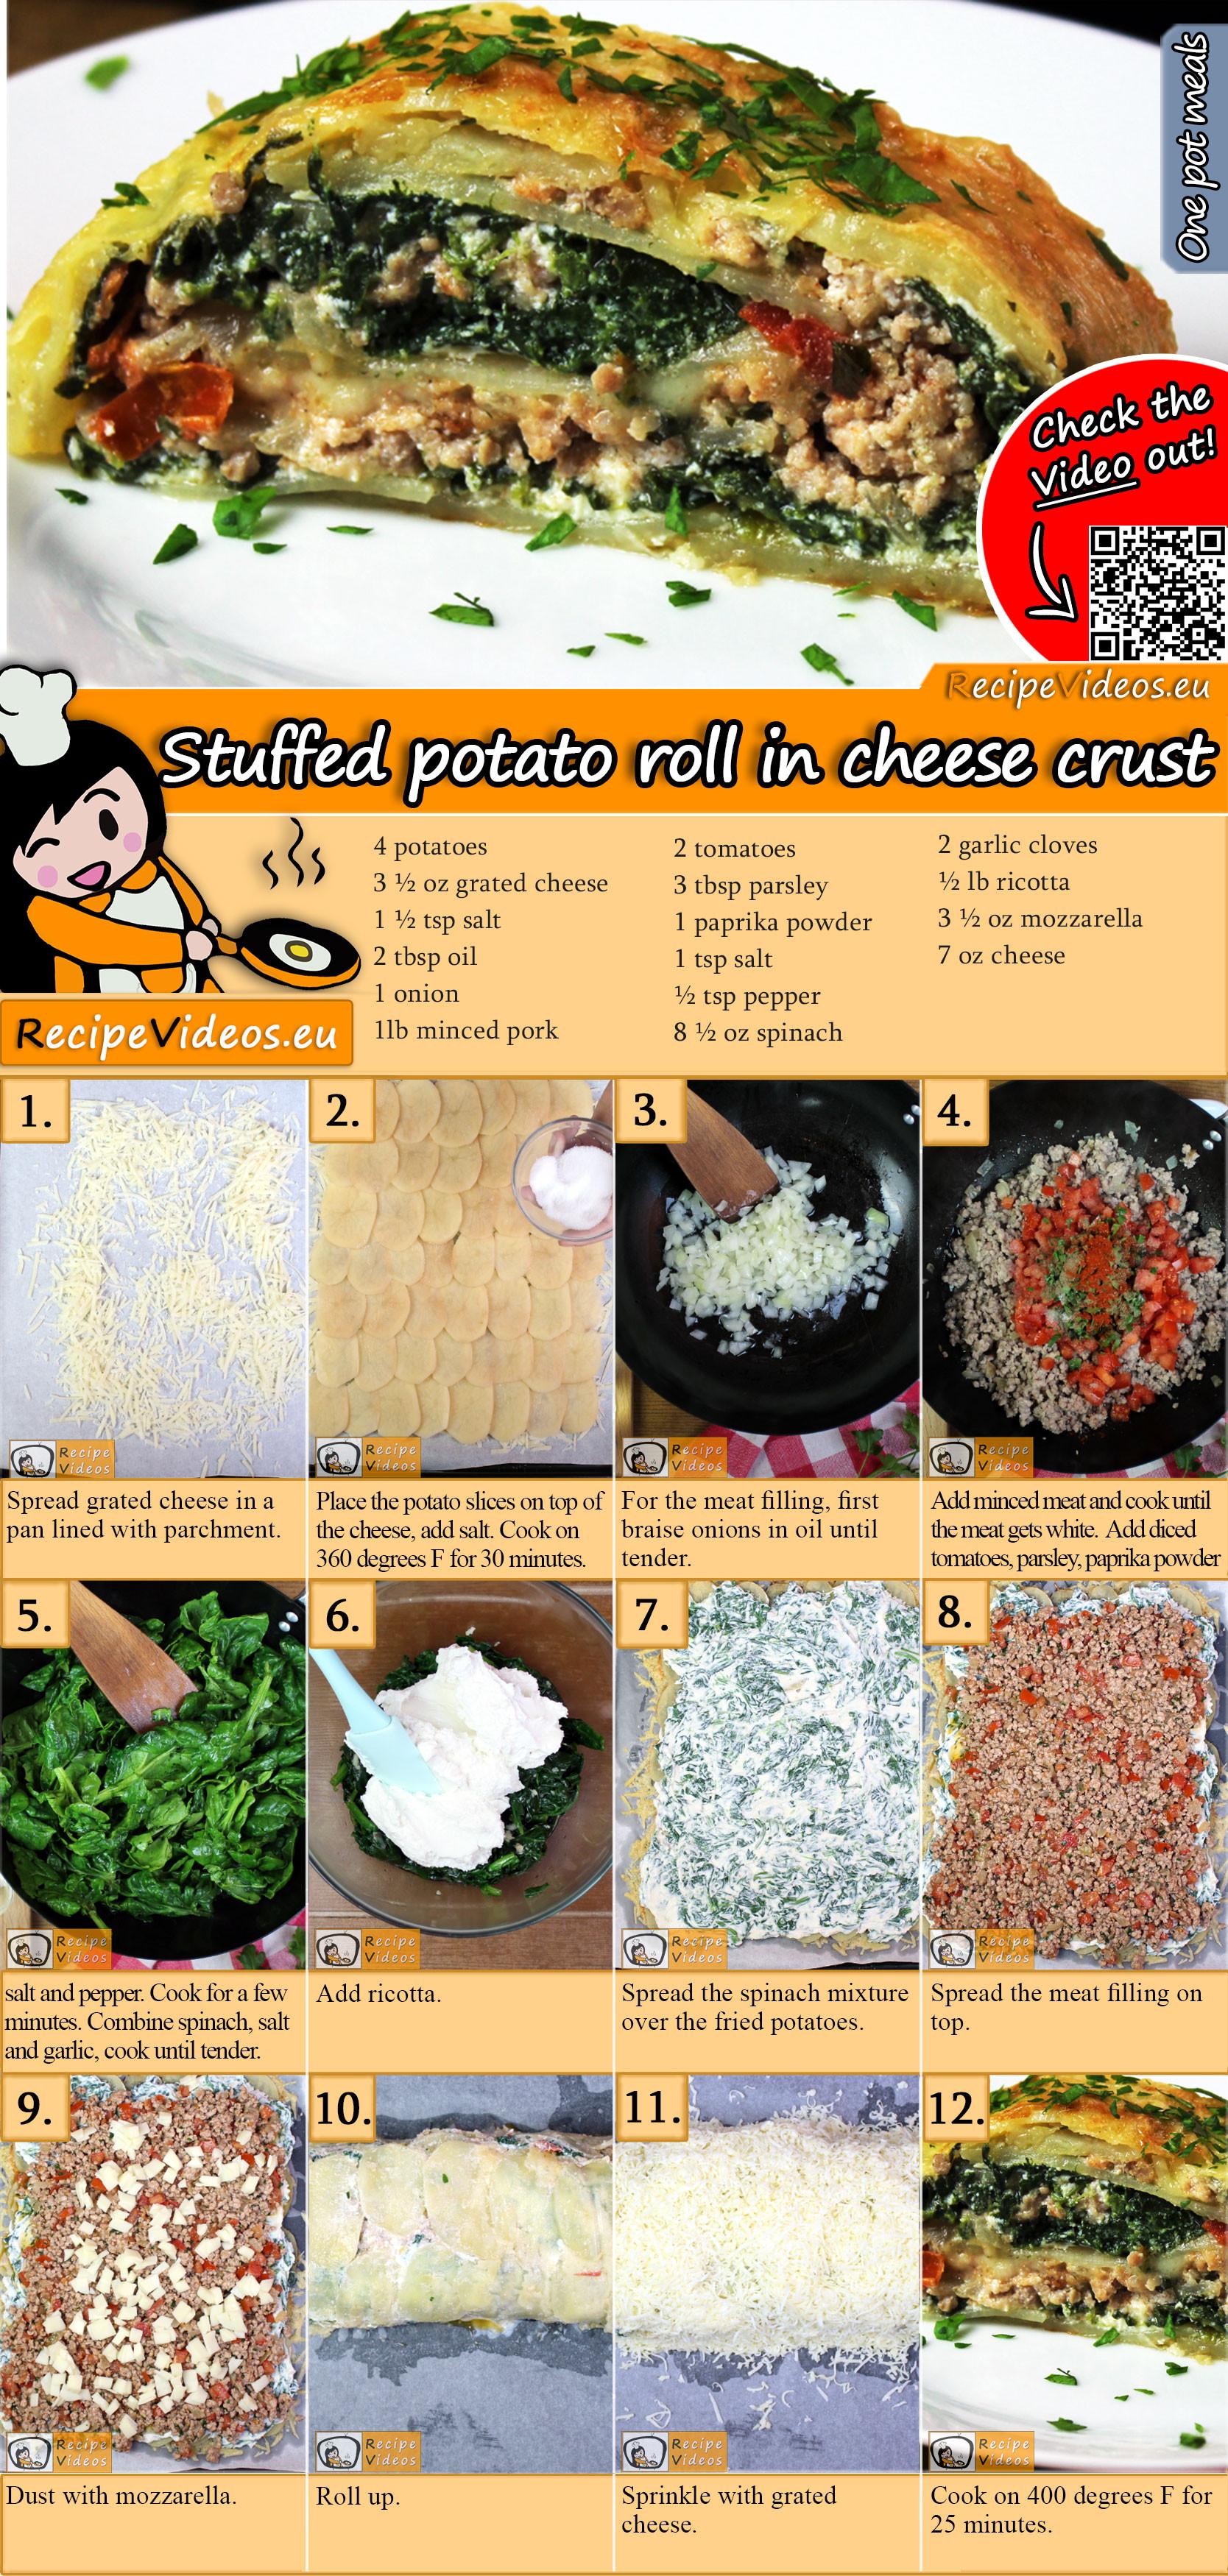 Stuffed potato roll in cheese crust recipe with video